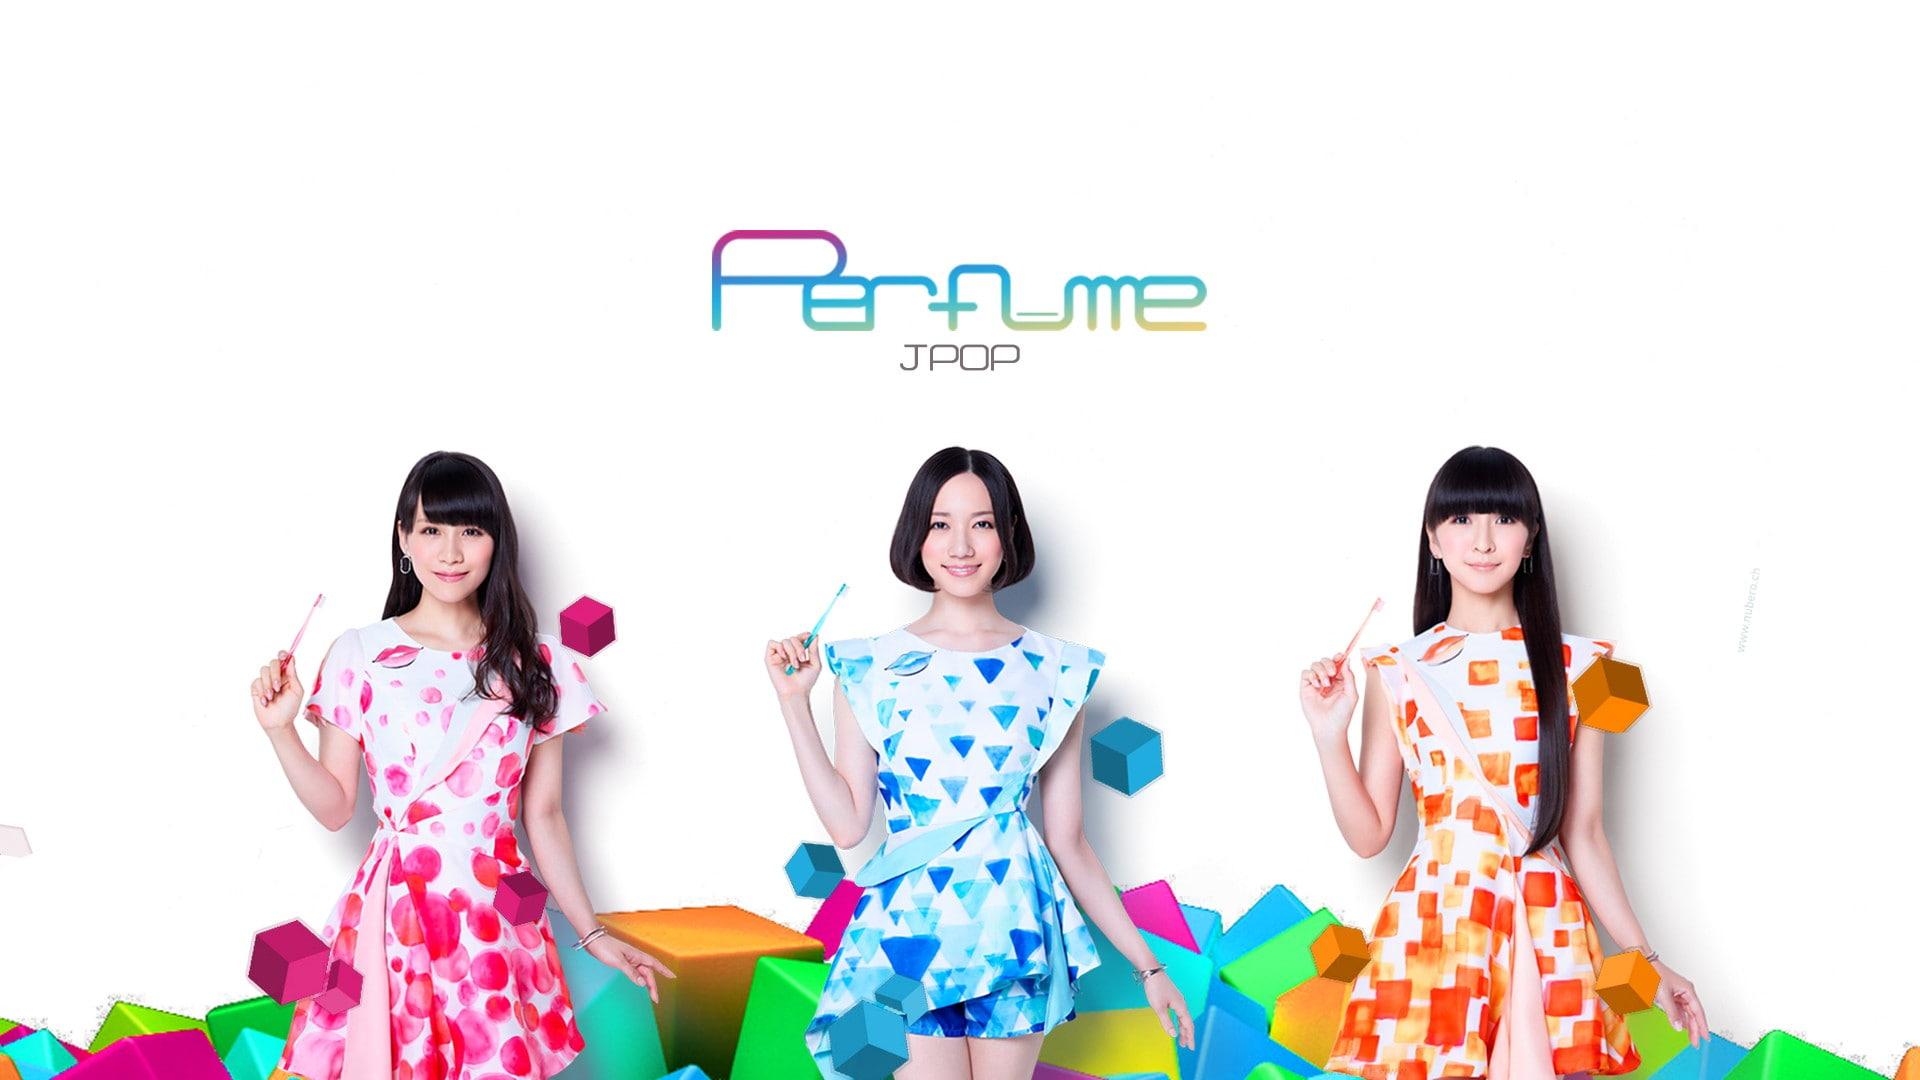 HD wallpaper Perfume Band Pafyumu Achan Nocchi kashiyuka 1920x1080